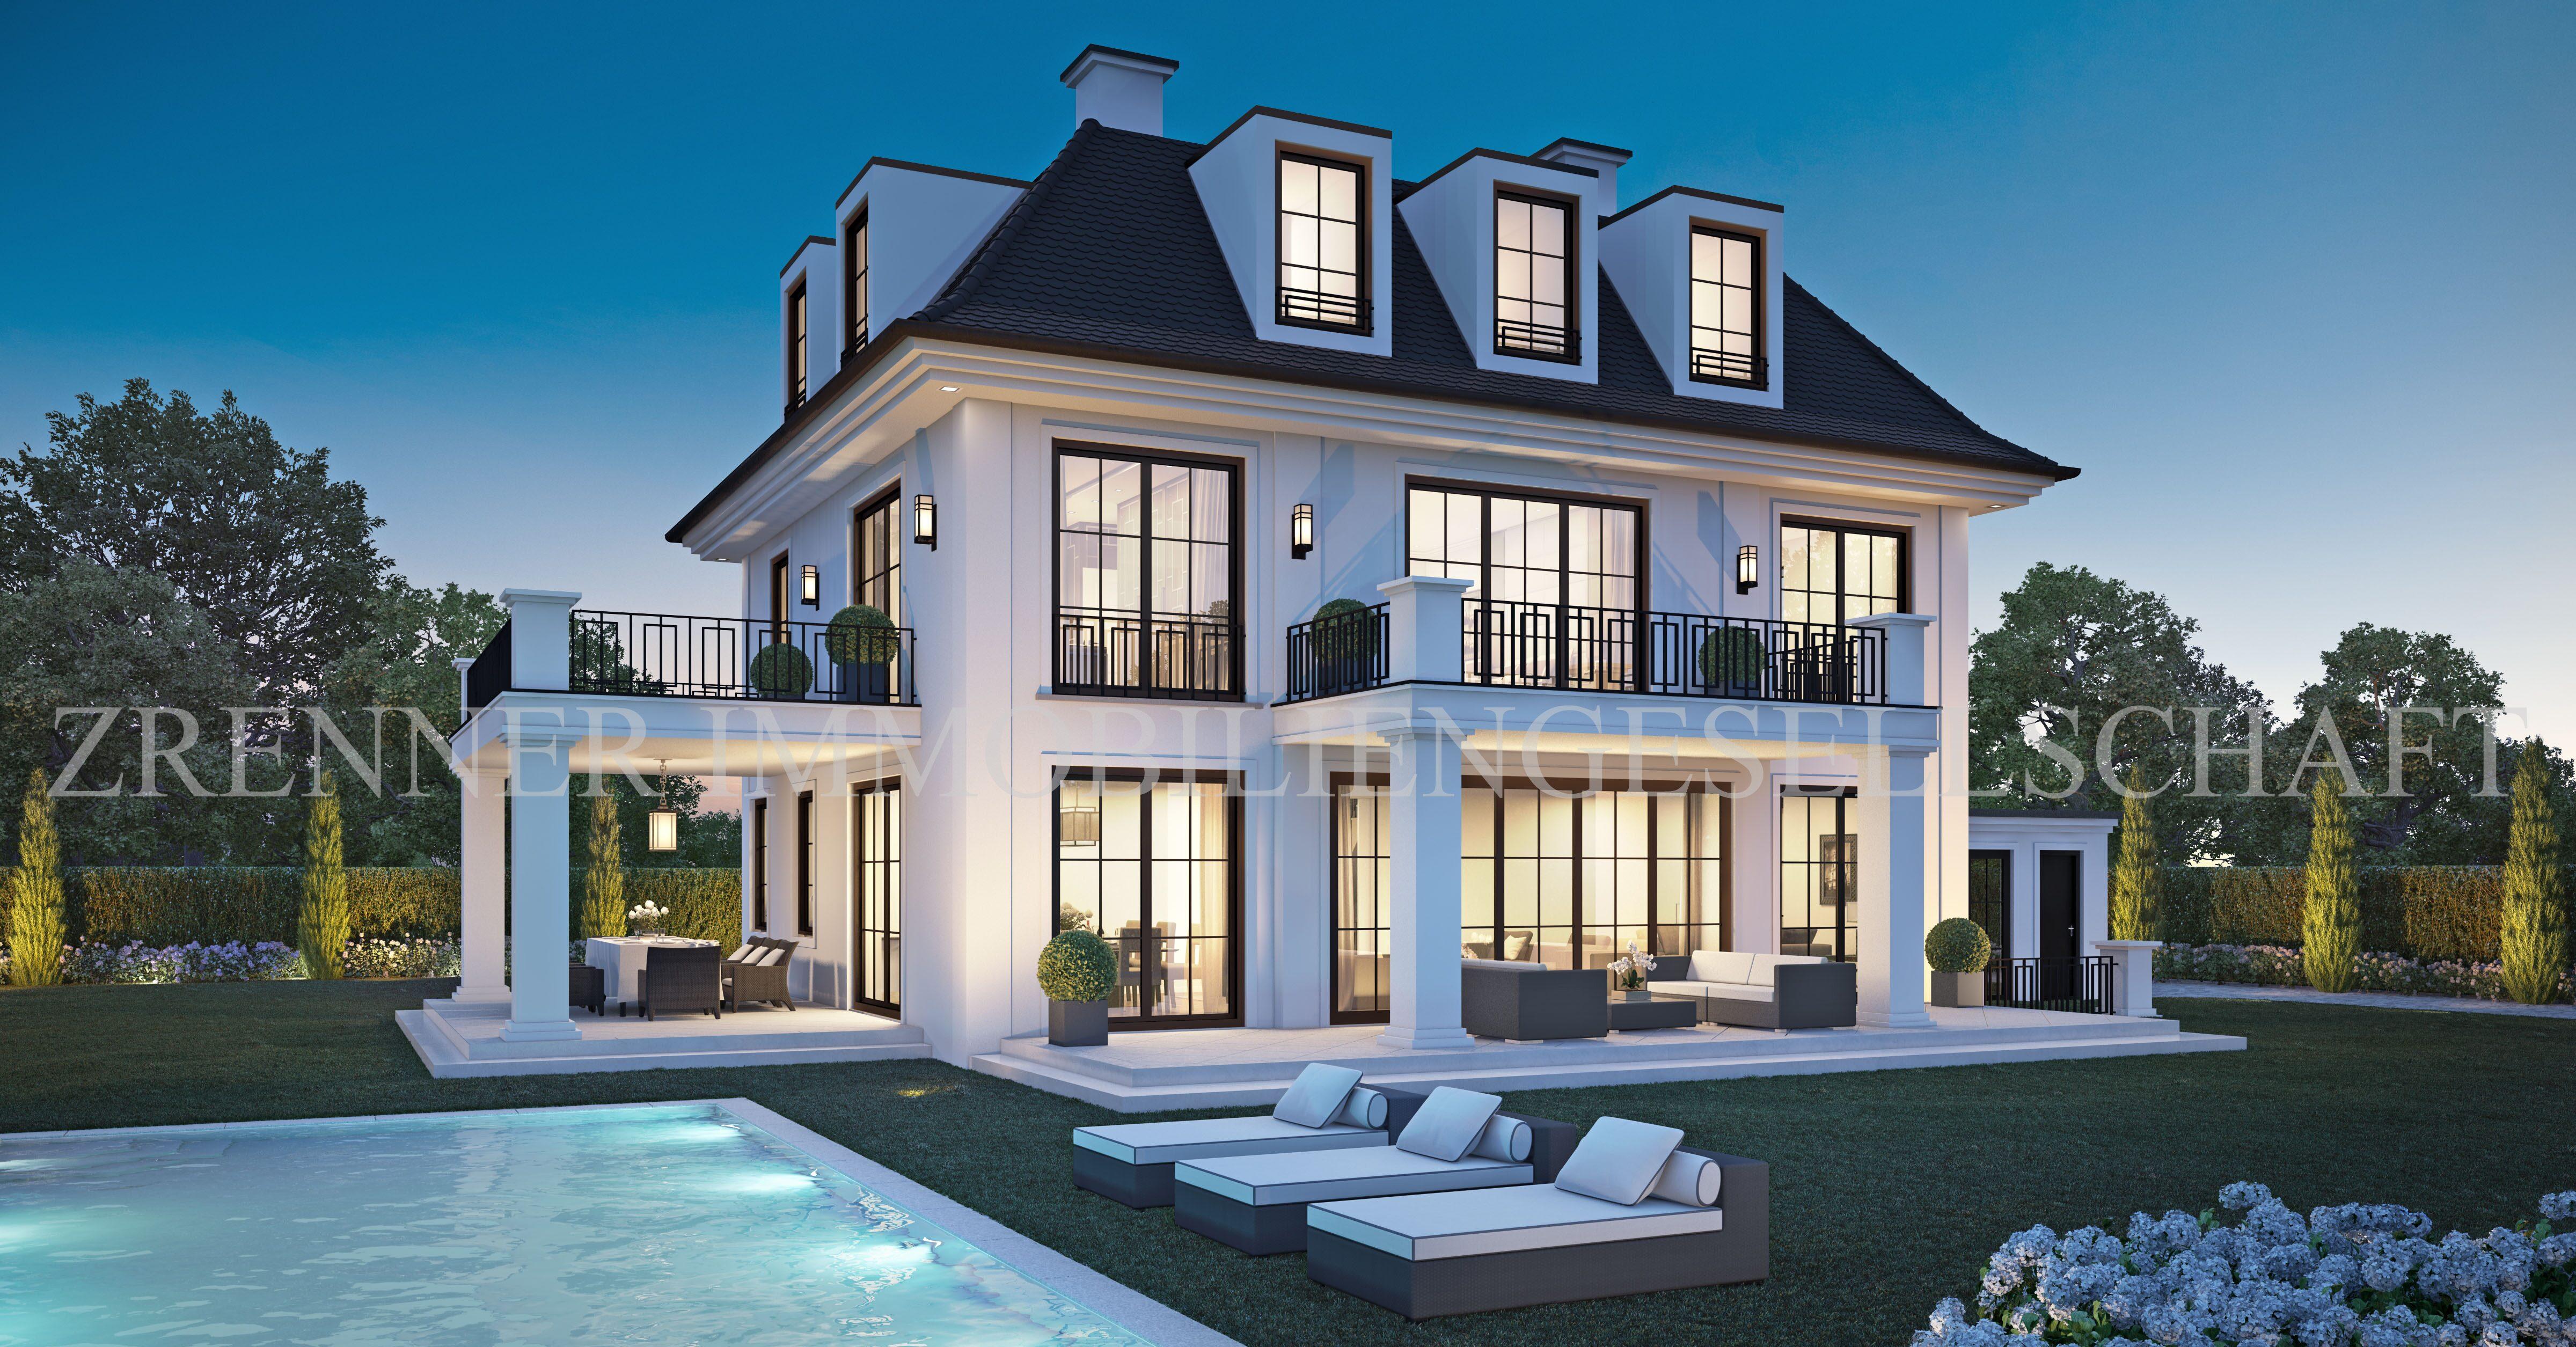 g7 palais graf seyssel the new classic bestlage m nchen gr nwald zrenner. Black Bedroom Furniture Sets. Home Design Ideas